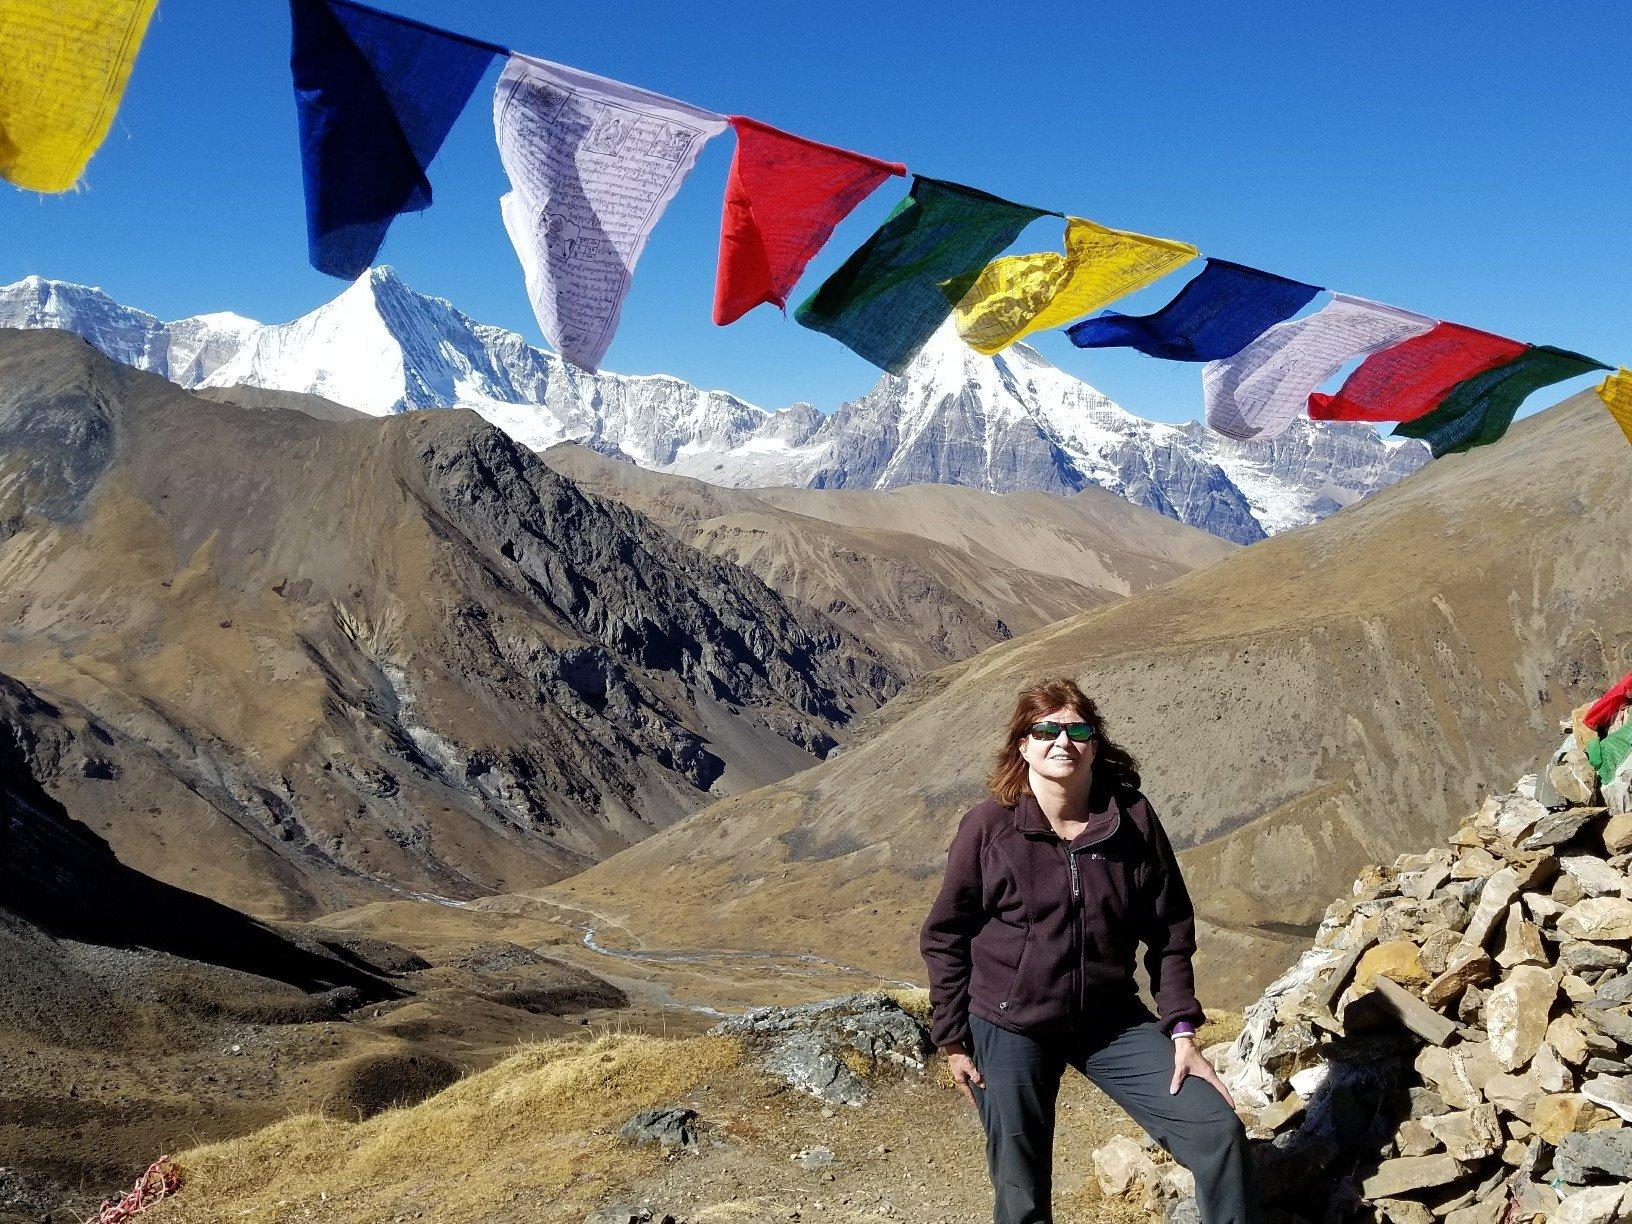 Bhutan_traveler_flags.jpg